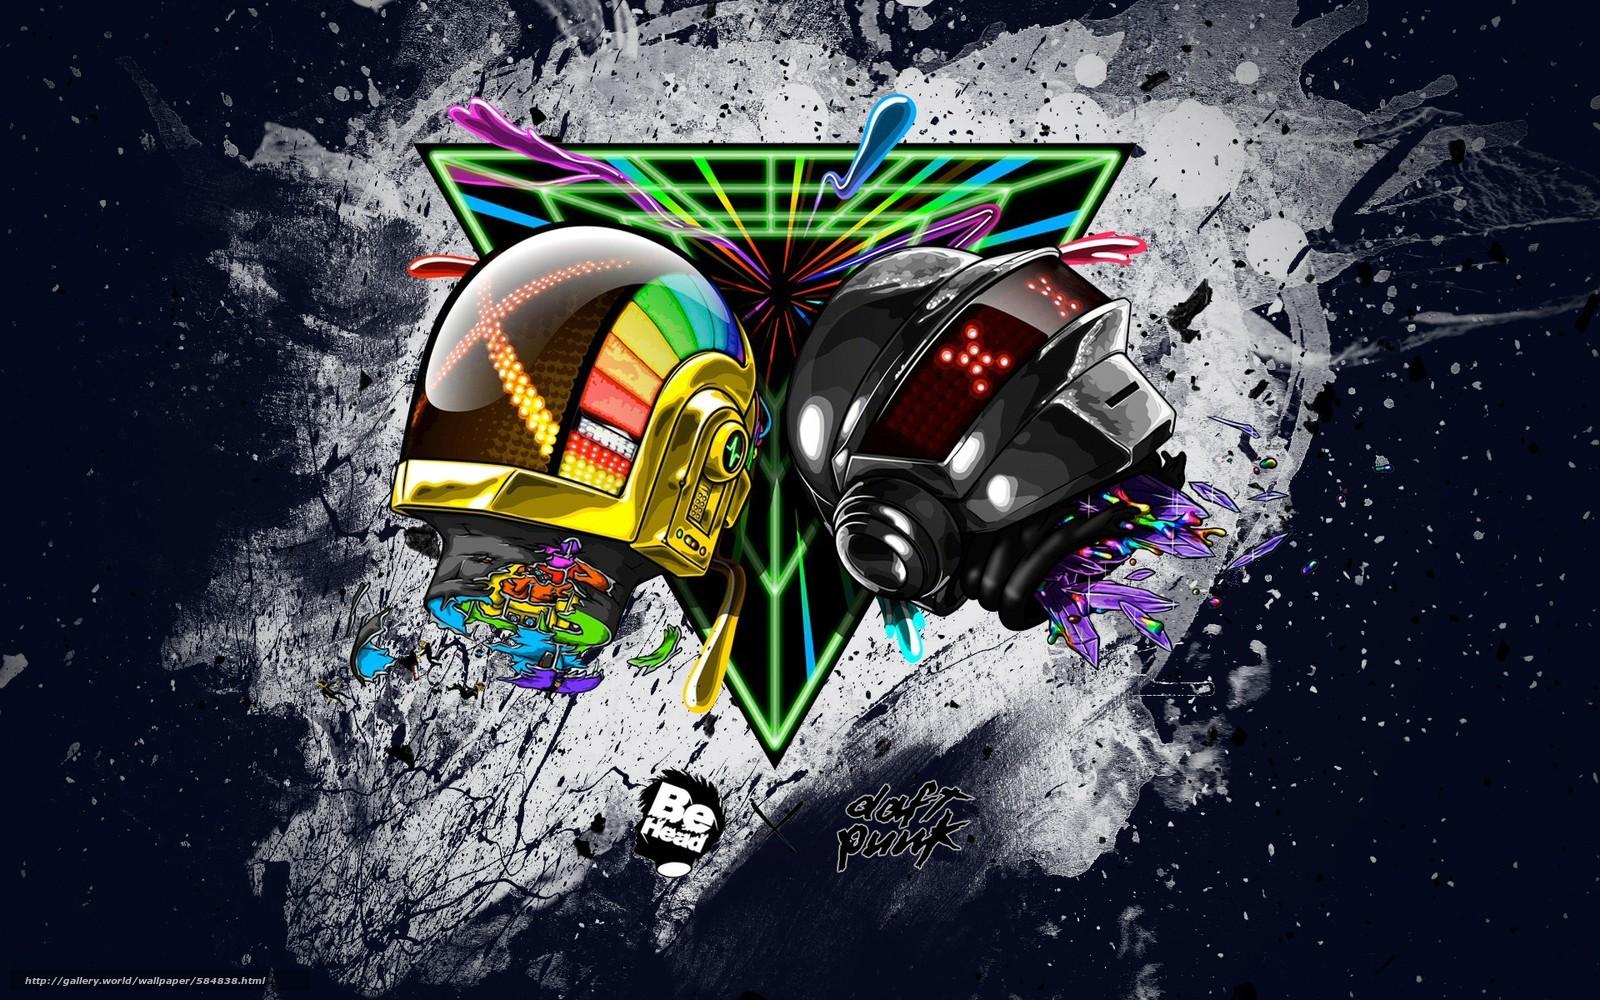 дафт панк, стиль, шлем